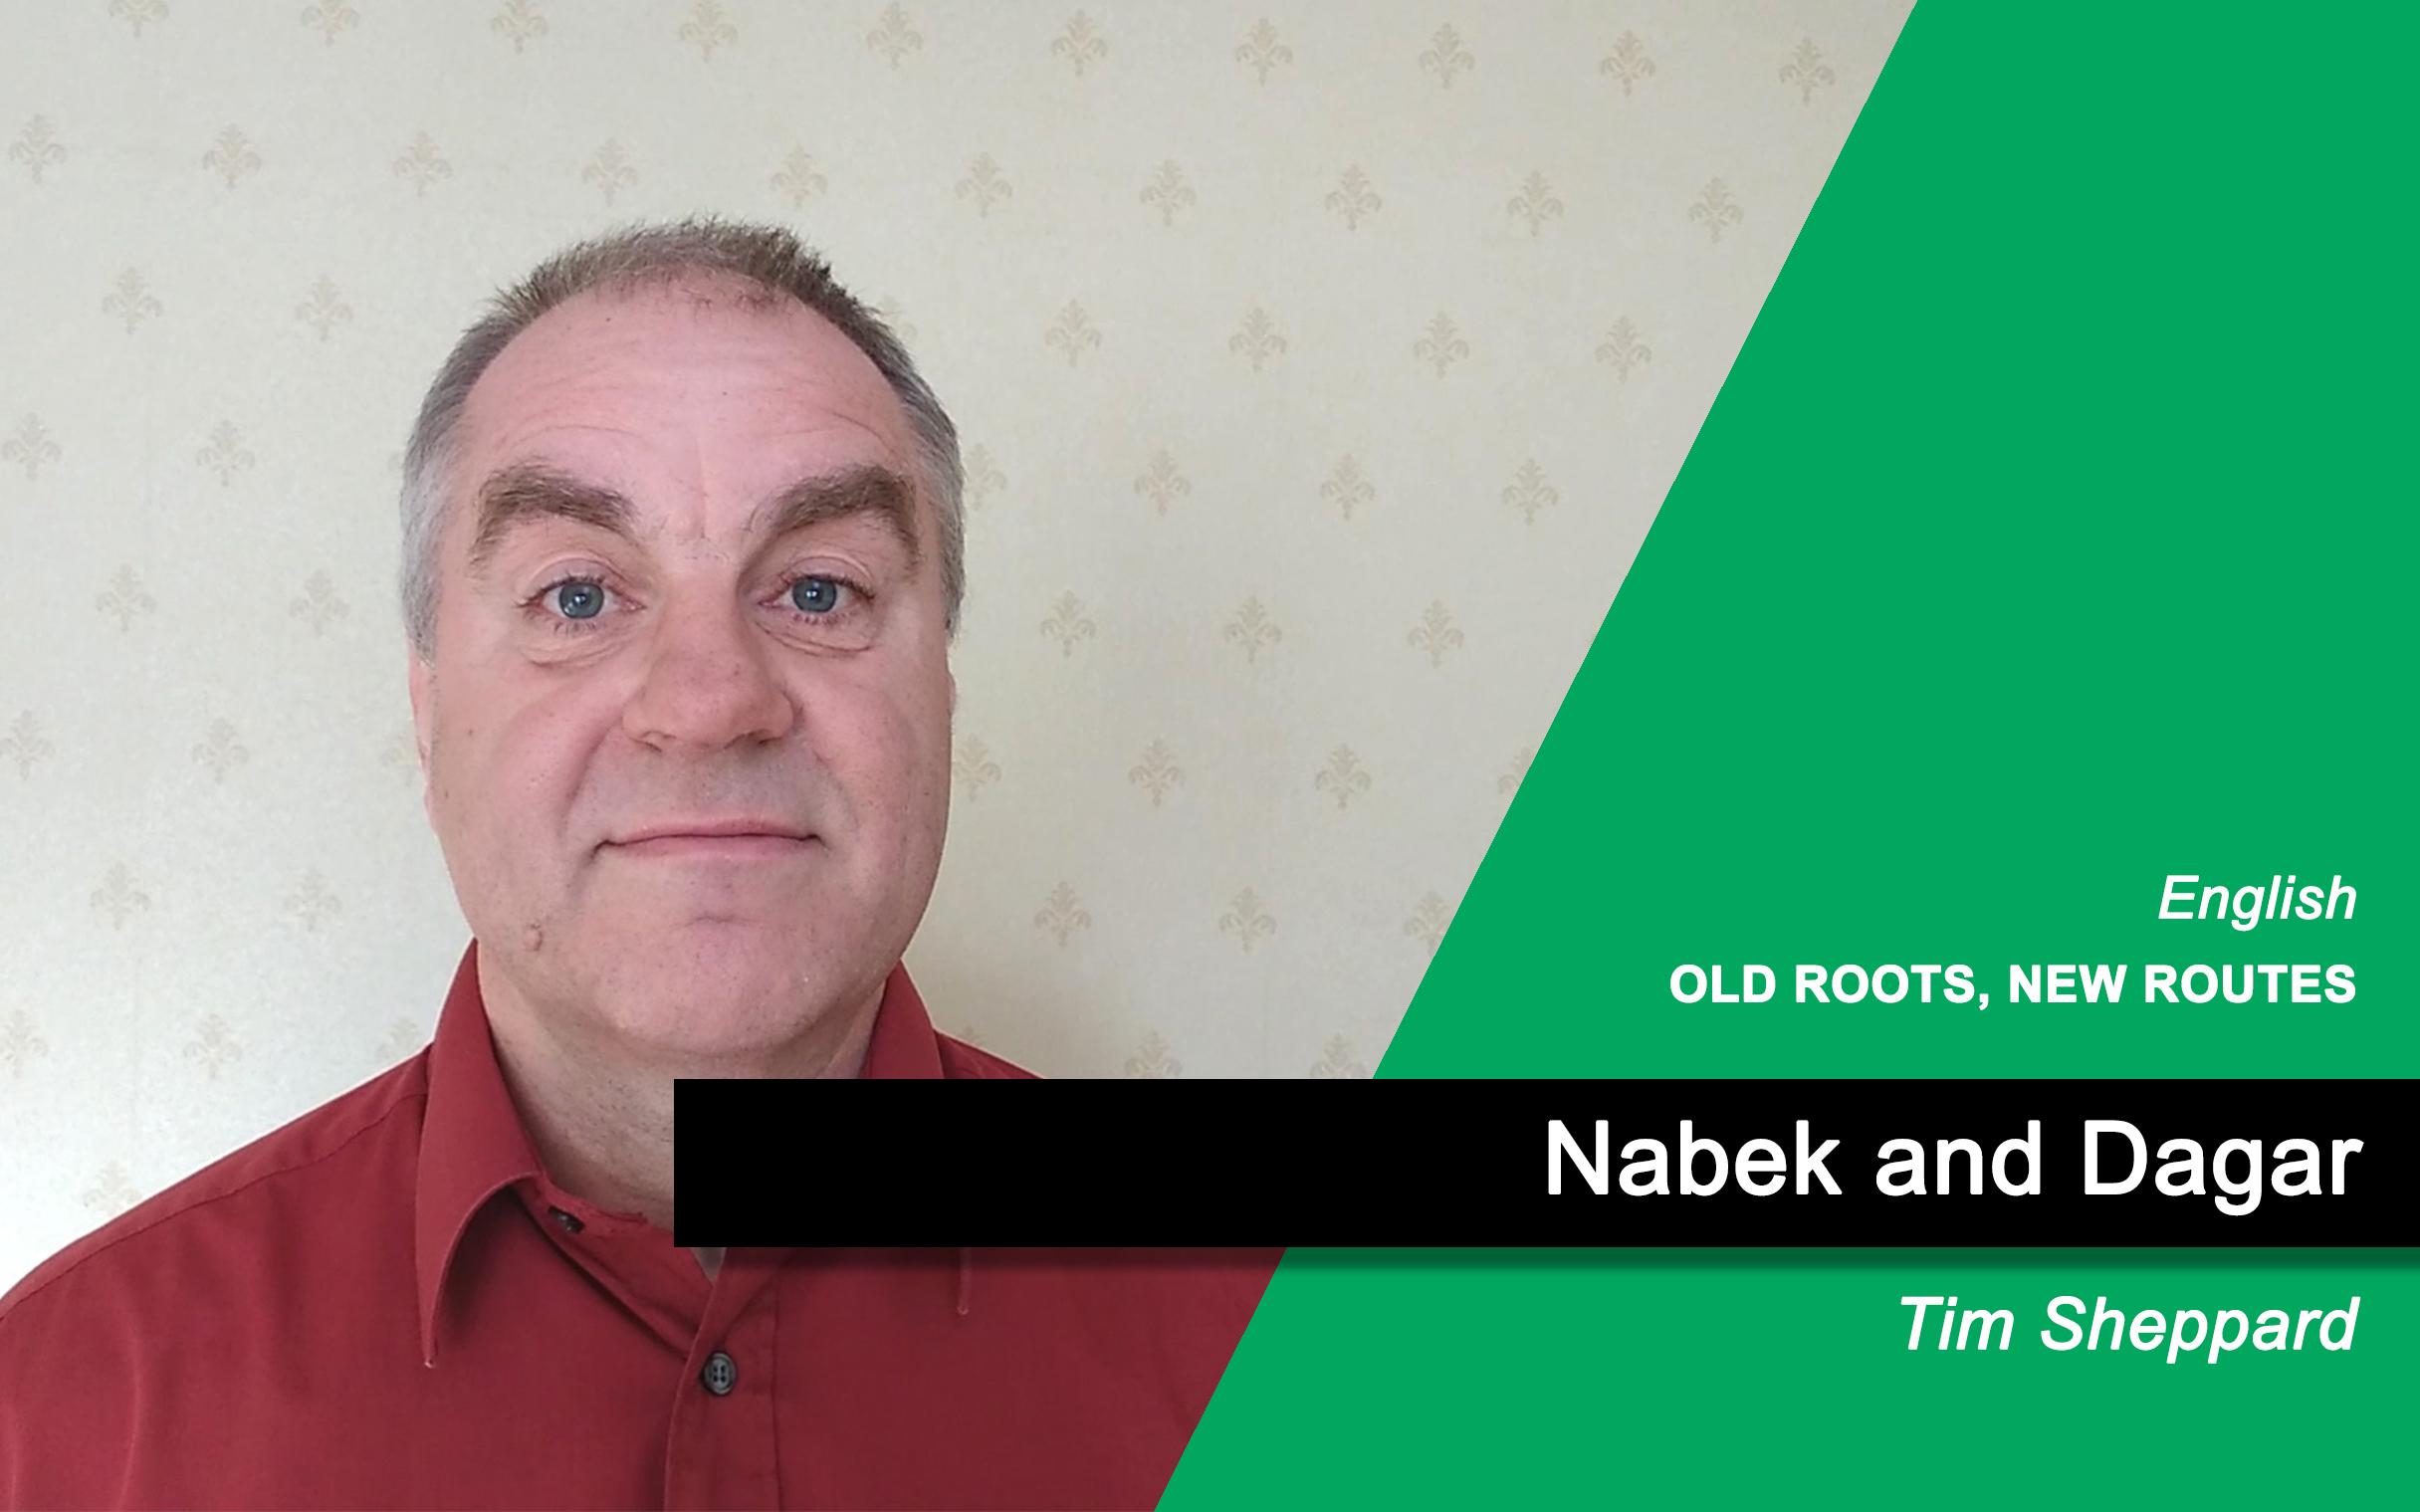 Nabek and Dagar